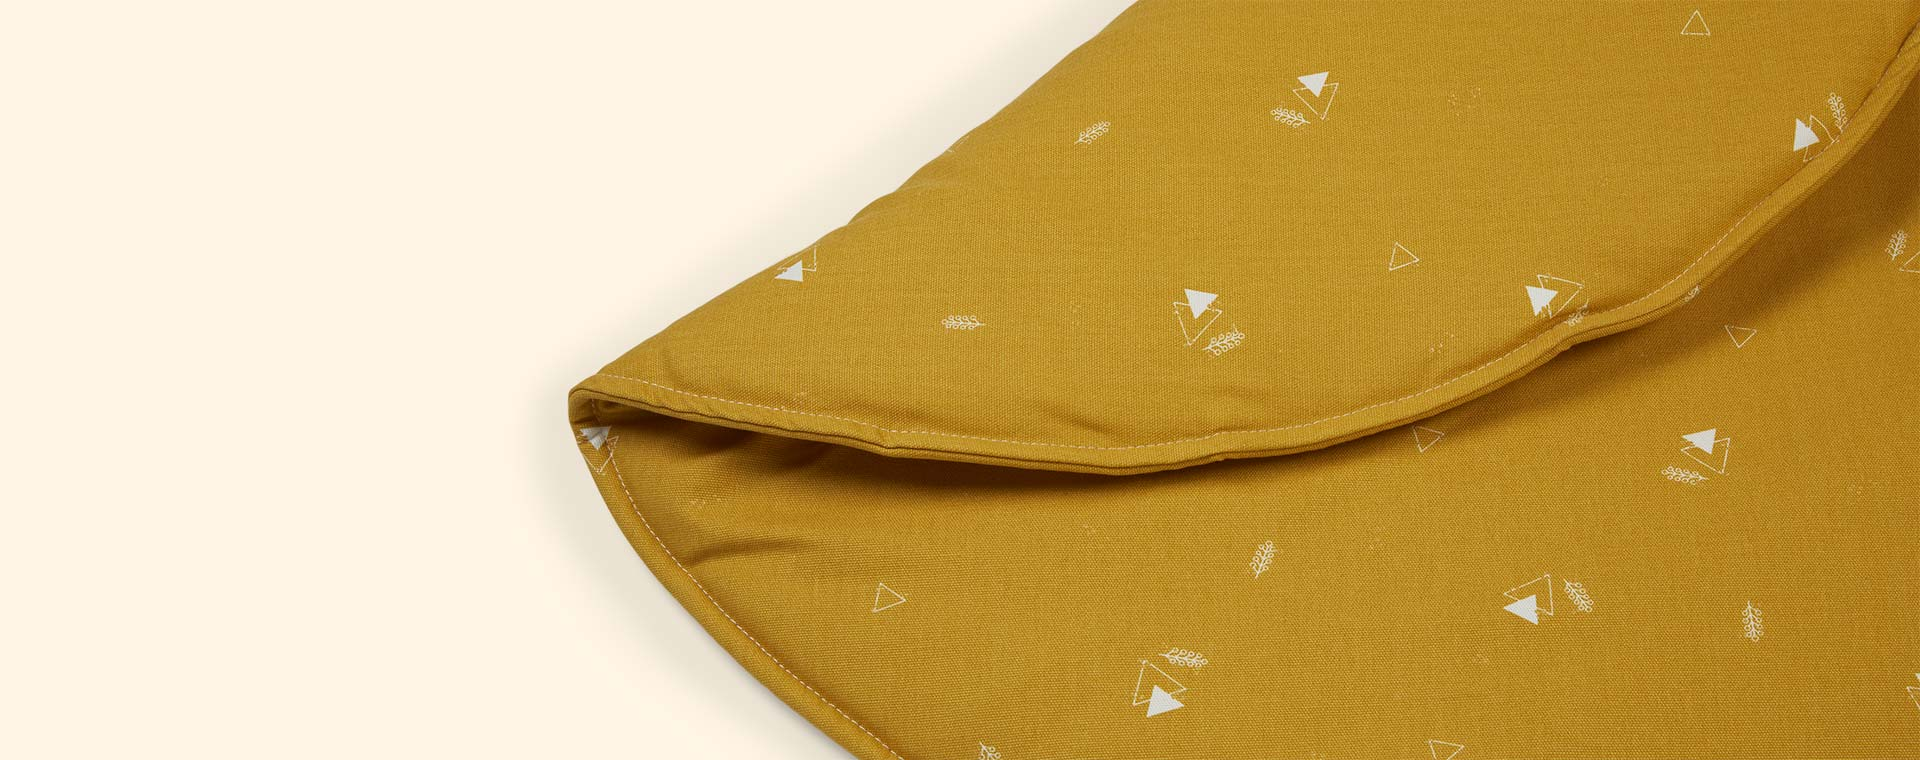 Honey Mustard wigiwama Playmat